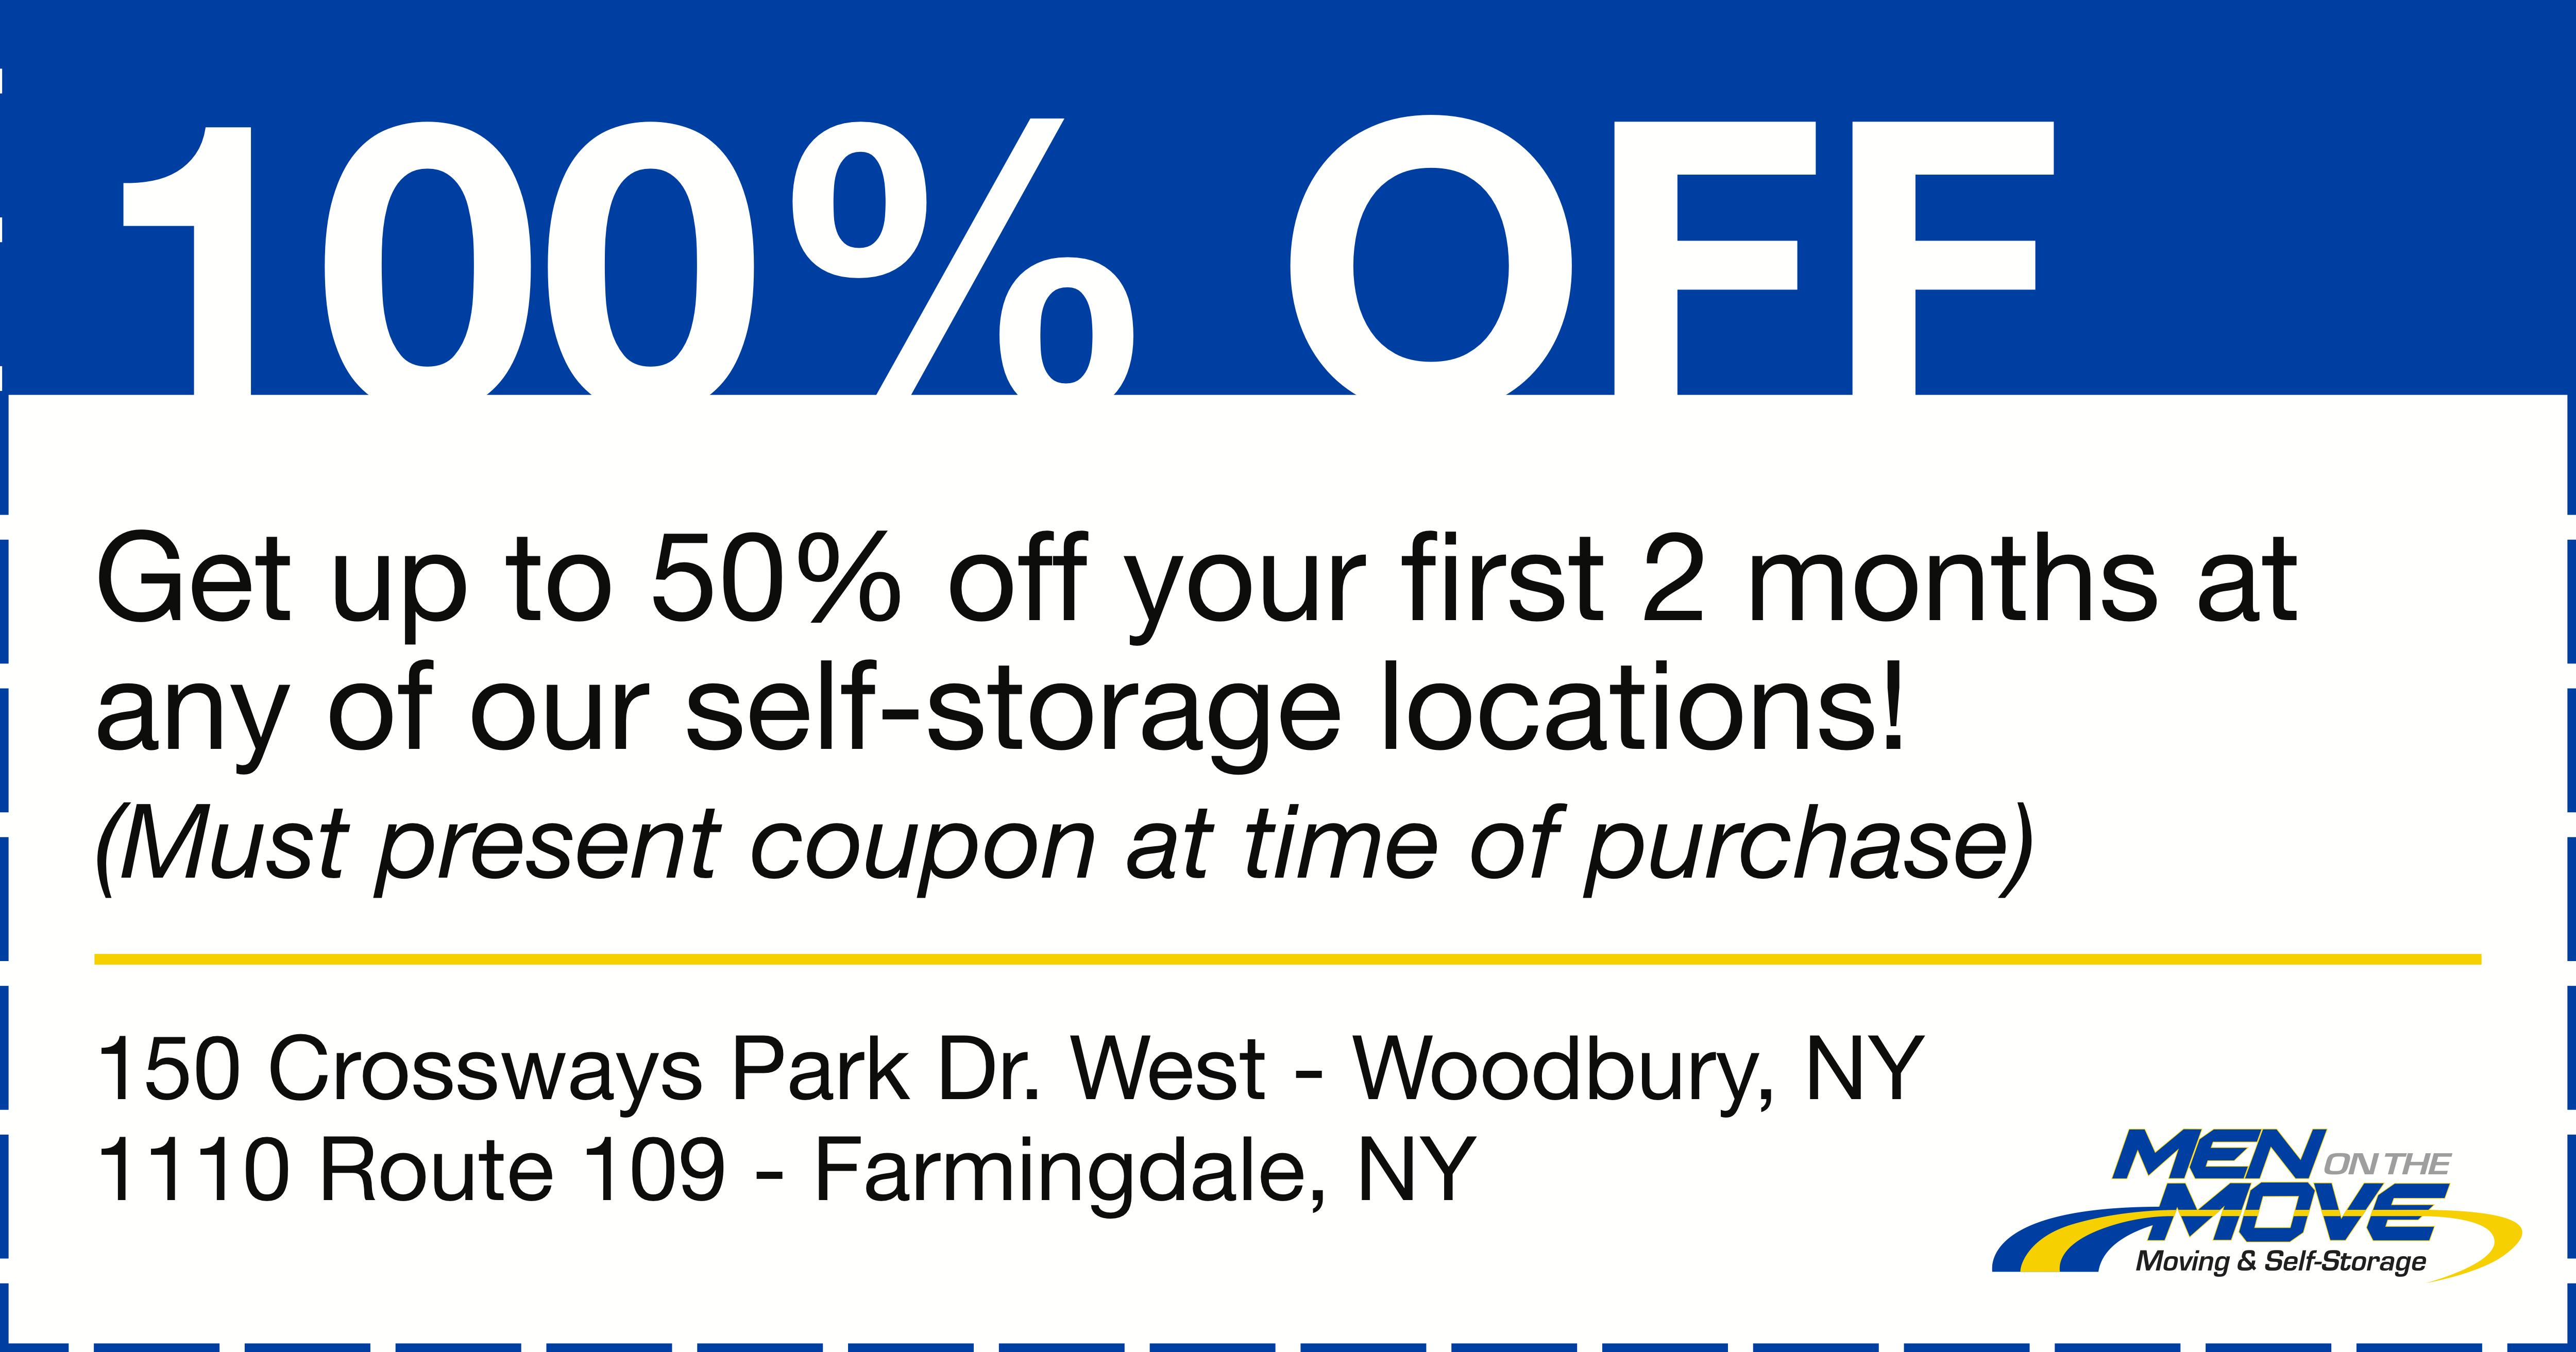 Long Island Self-Storage Company